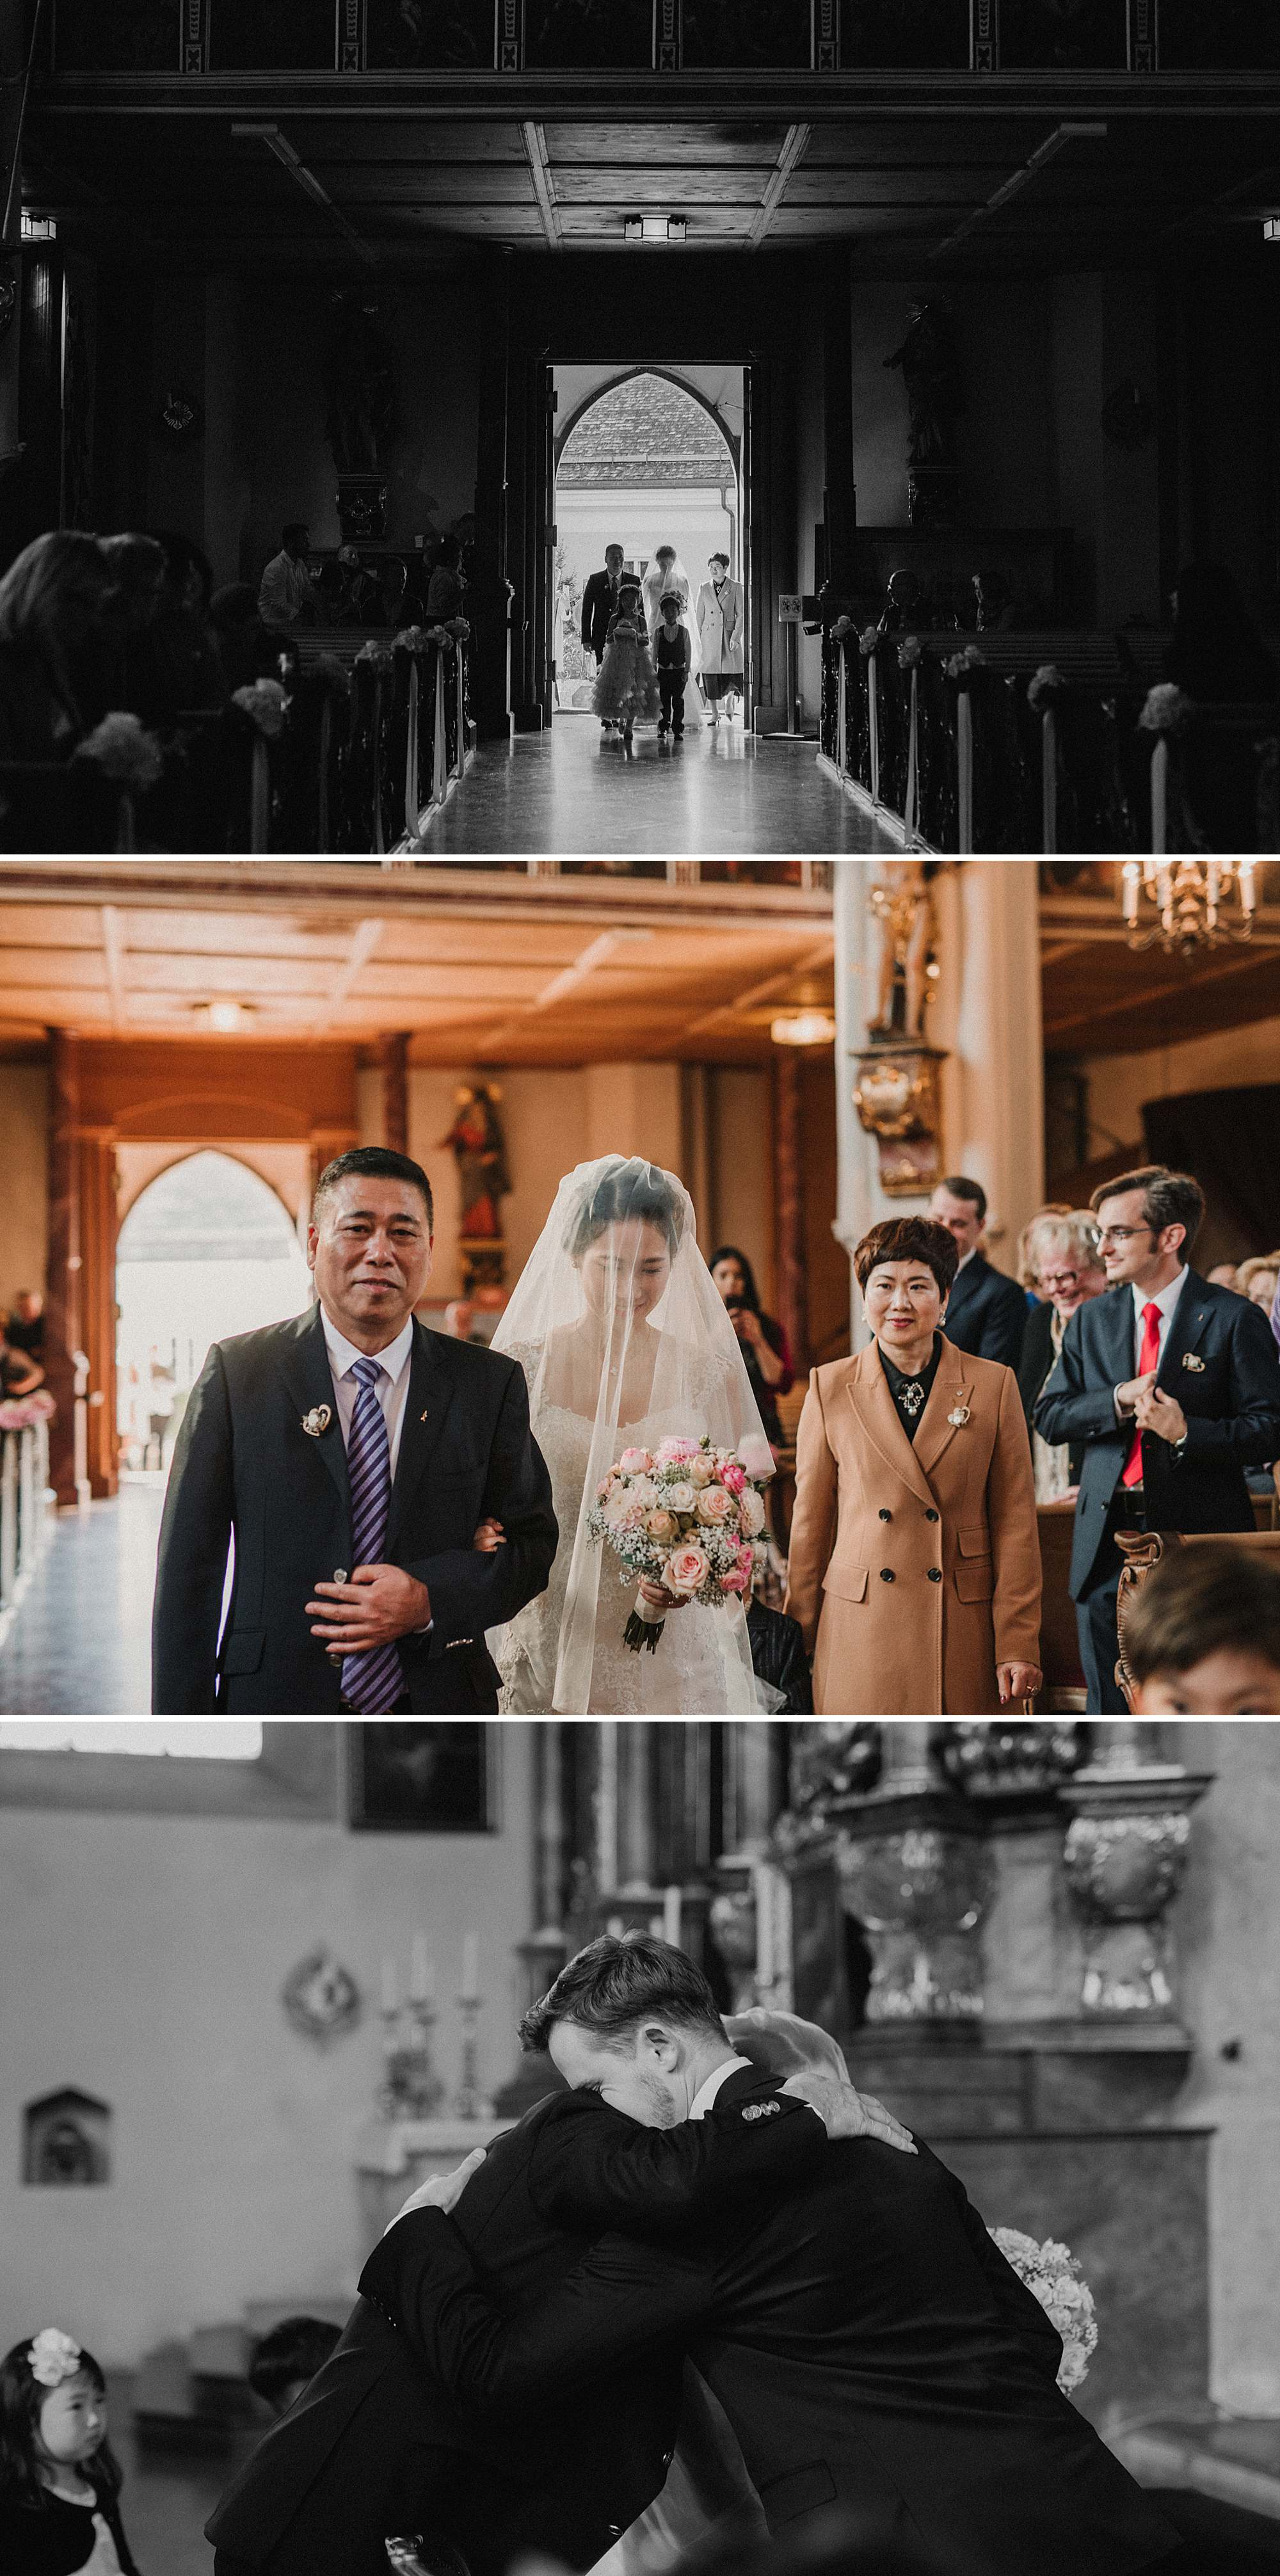 kitzbuehel wedding photographer_0091.jpg